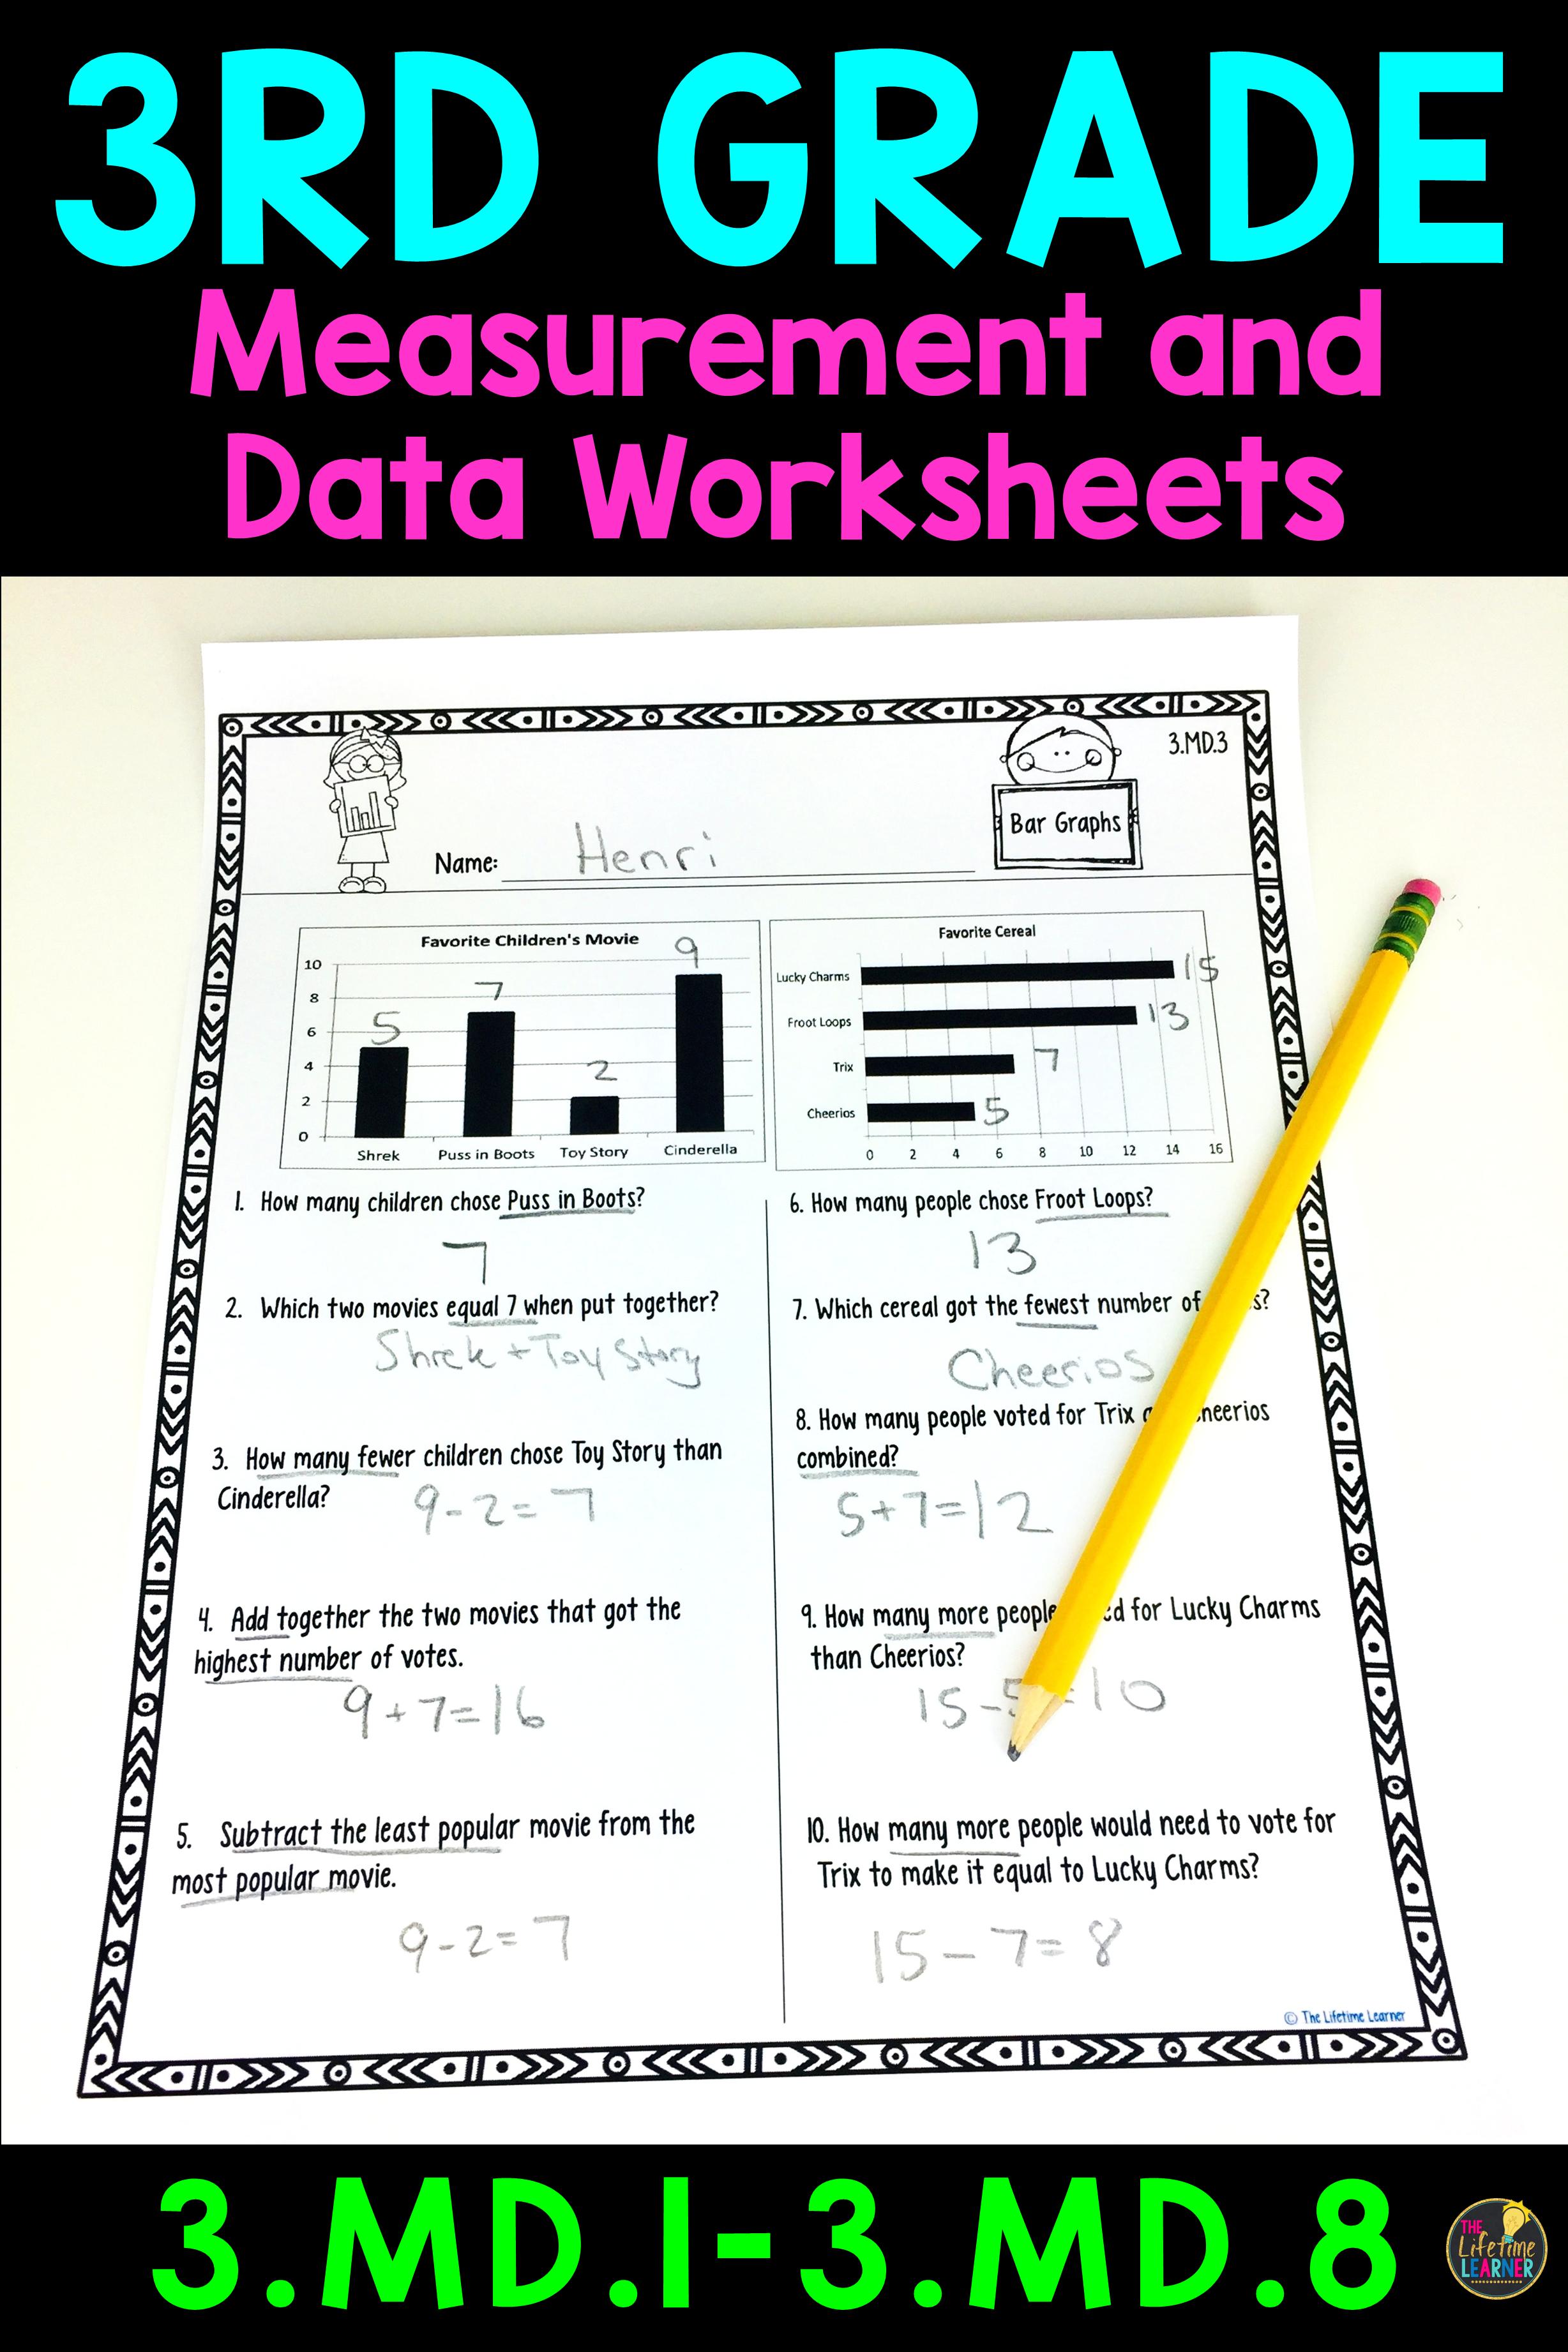 medium resolution of 3rd Grade Measurement and Data Worksheets   Measurement worksheets